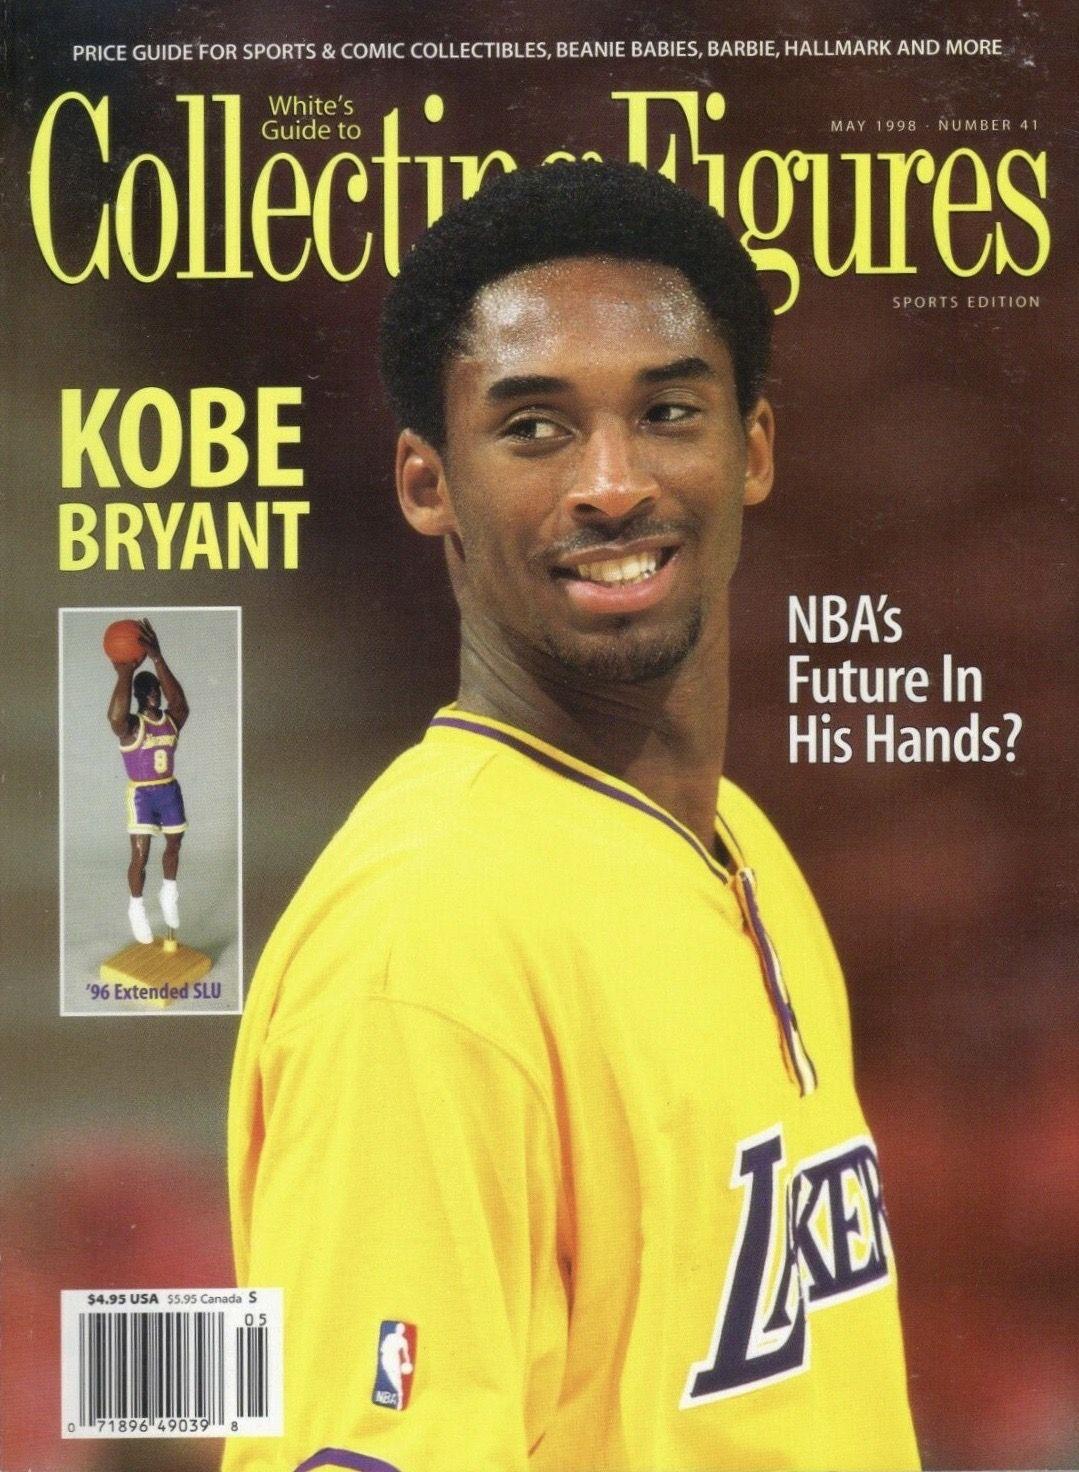 Pin By Mero On 248365kobe Com In 2020 Kobe Bryant Nba Kobe Bryant Wallpaper Kobe Bryant Black Mamba